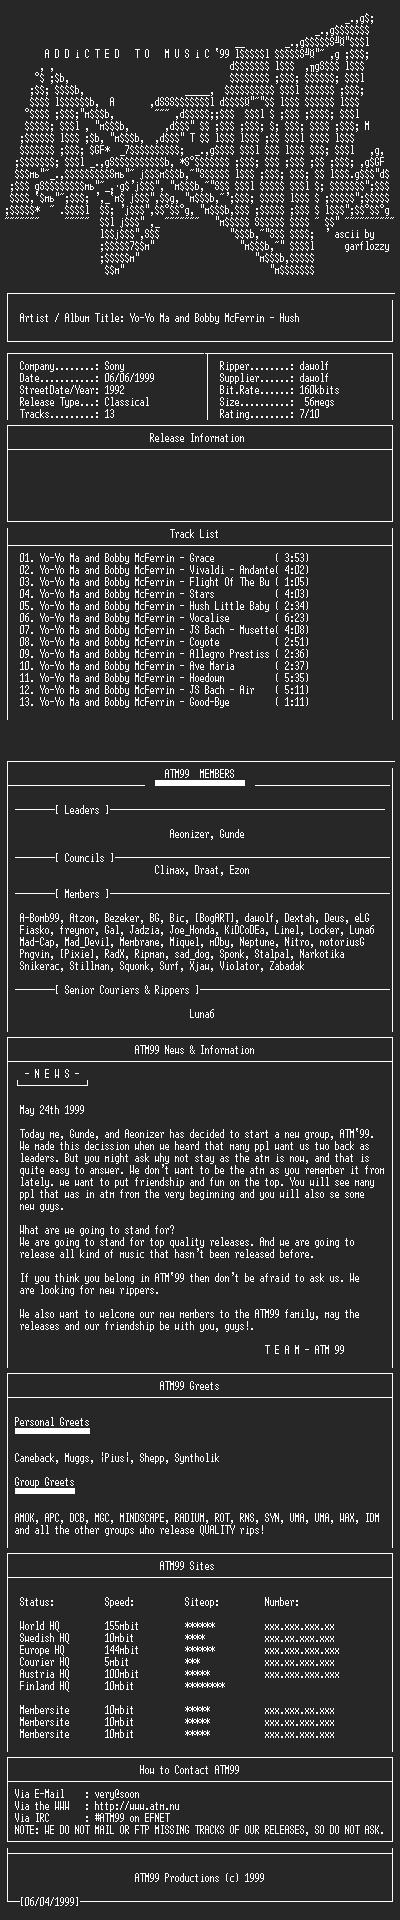 NFO file for Yo-Yo_Ma_and_Bobby_McFerrin_-_Hush_-_(1992)-ATM99